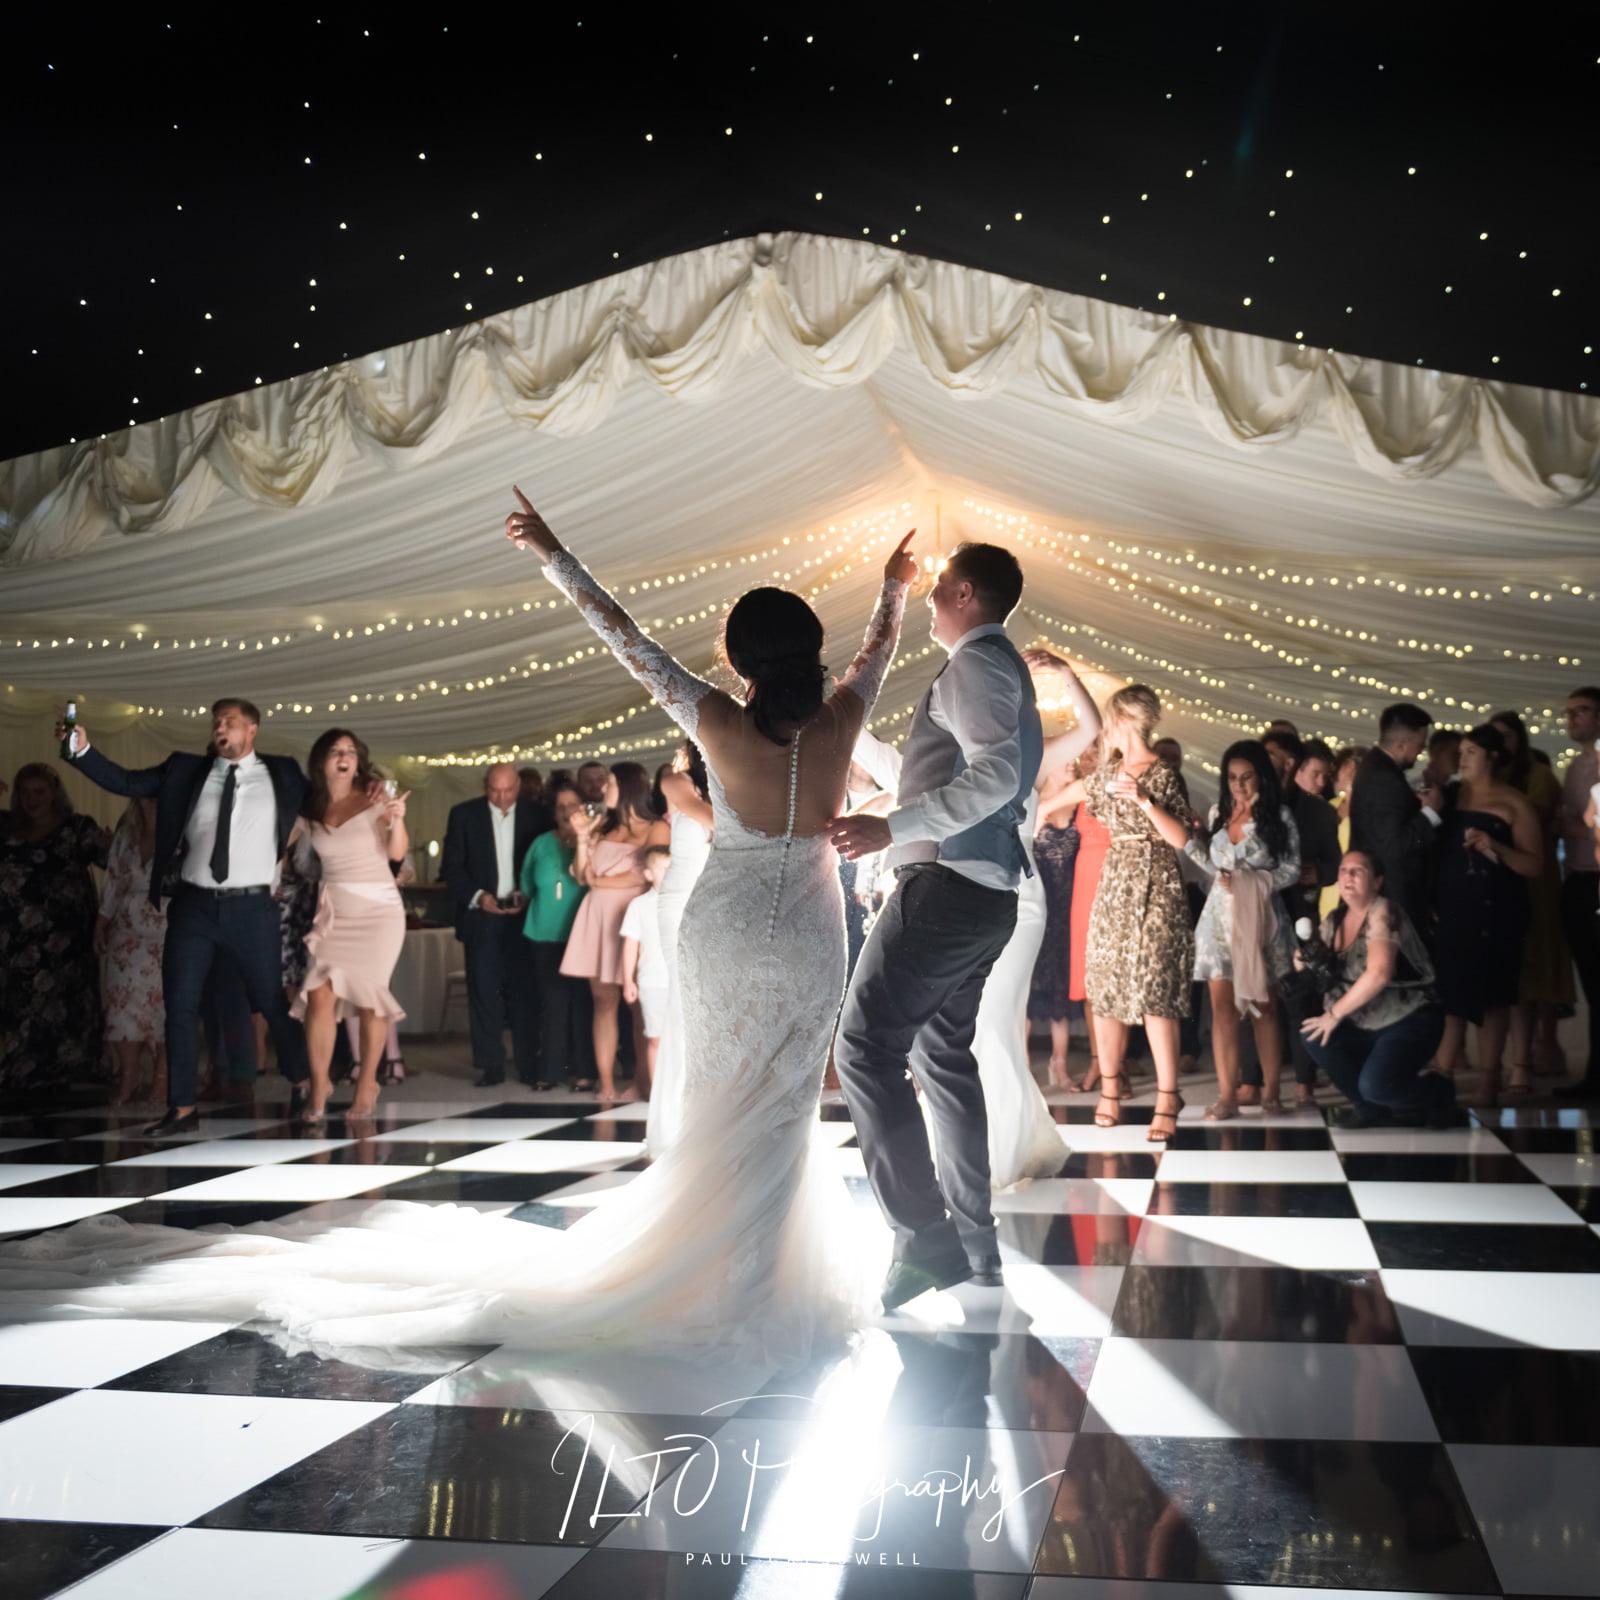 marquee wedding photo yorkshire wedding photographer